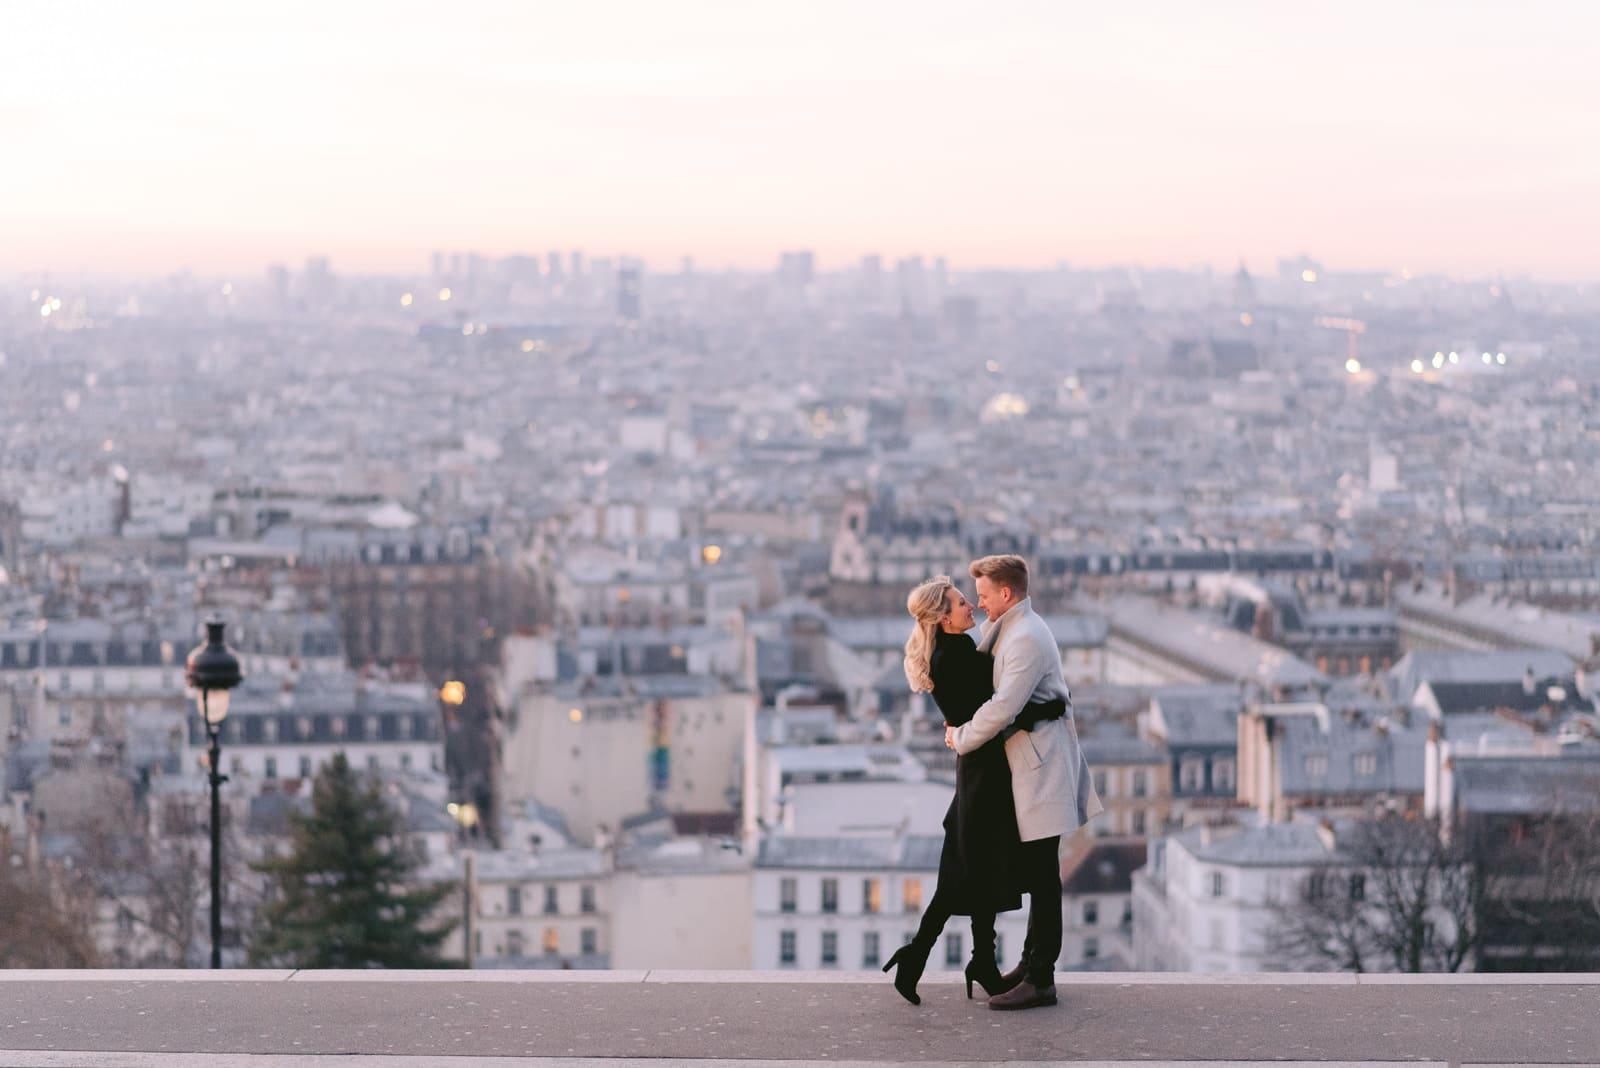 Paris proposal photographer - Engagement photos at Montmartre overlooking the city of Paris